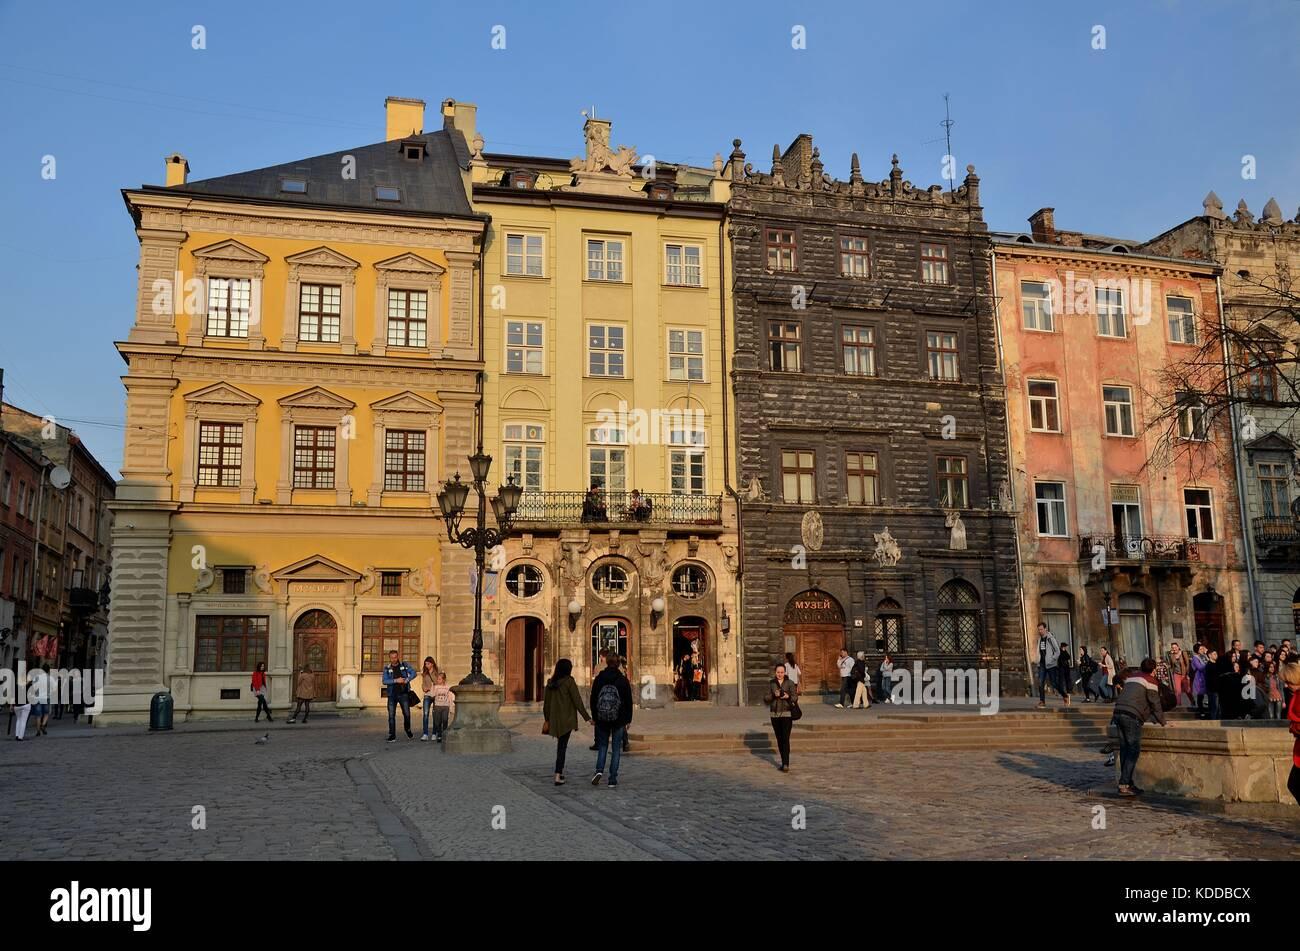 In der Altstadt von Lviv, Ukraine - Stock Image